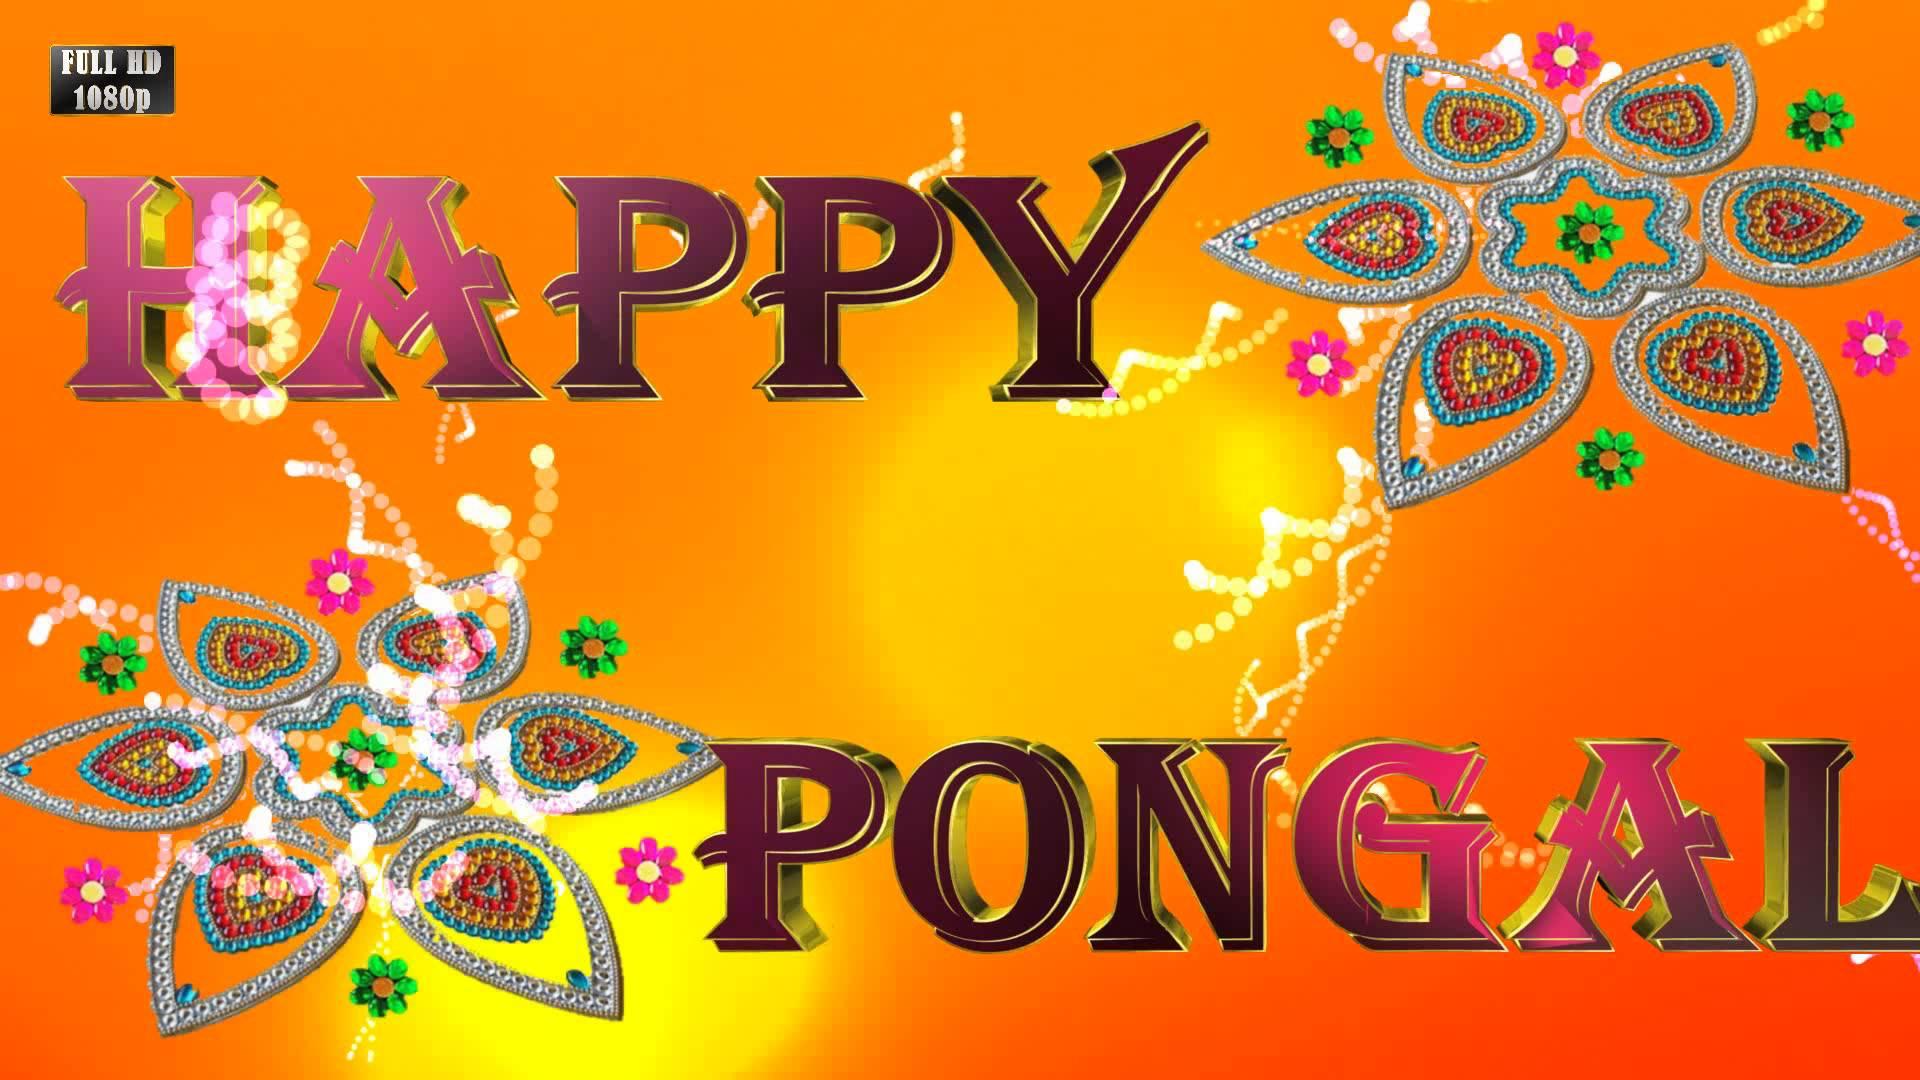 Pongal 2018 Video Download In Tamil Vinnyoleo Vegetalinfo